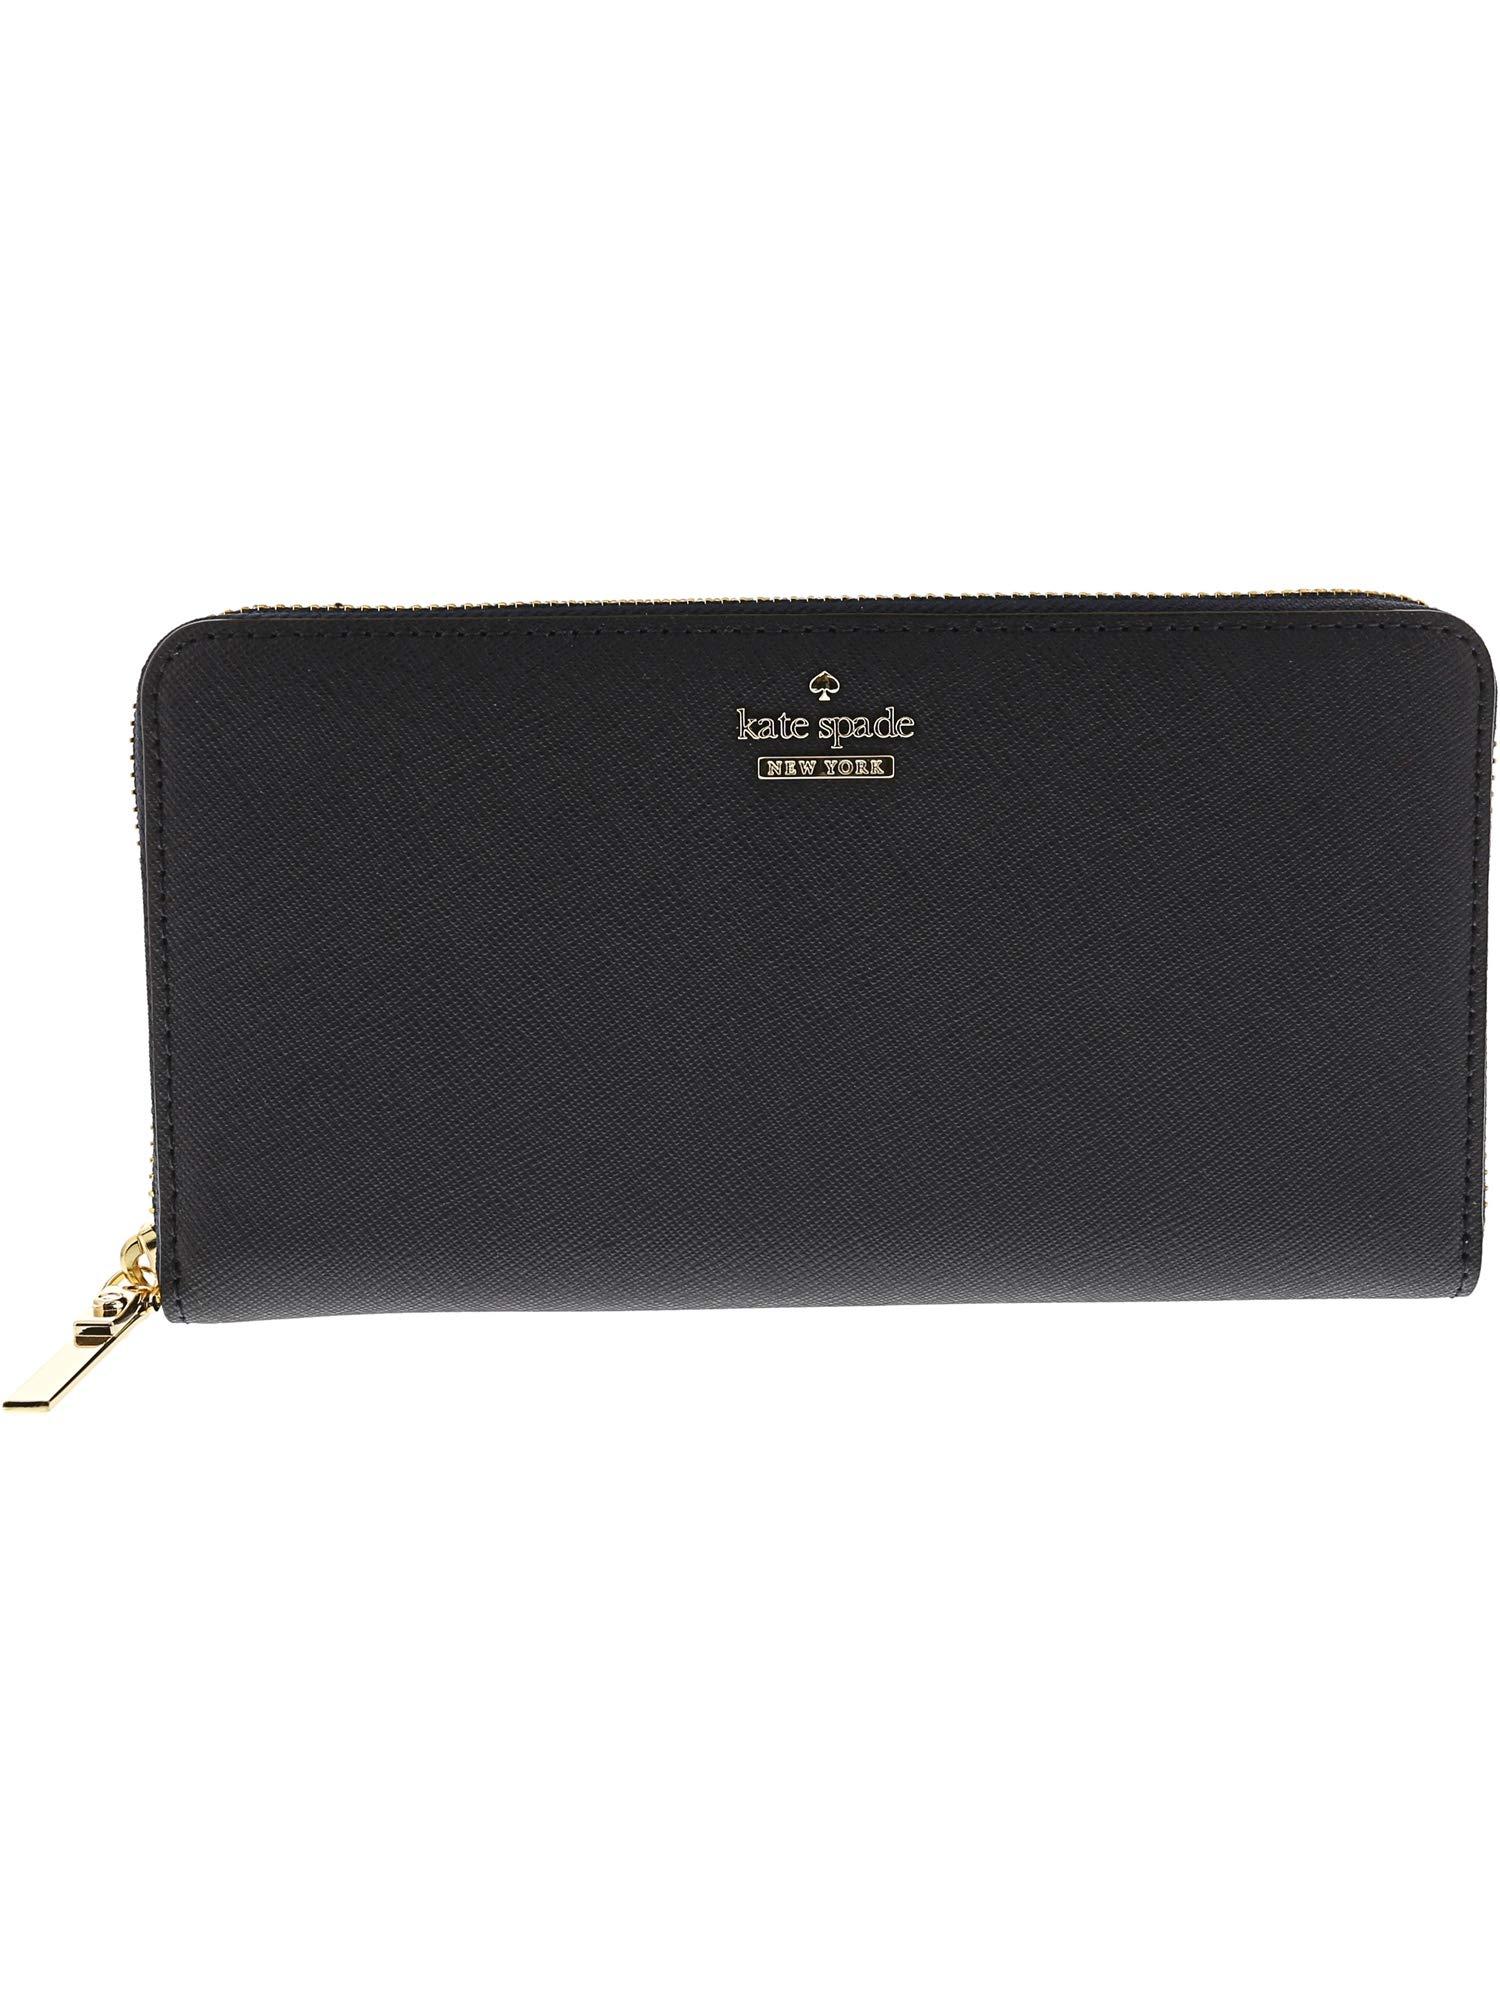 Kate Spade Women's Cameron Street Lacey Leather Wallet - Blazer Blue